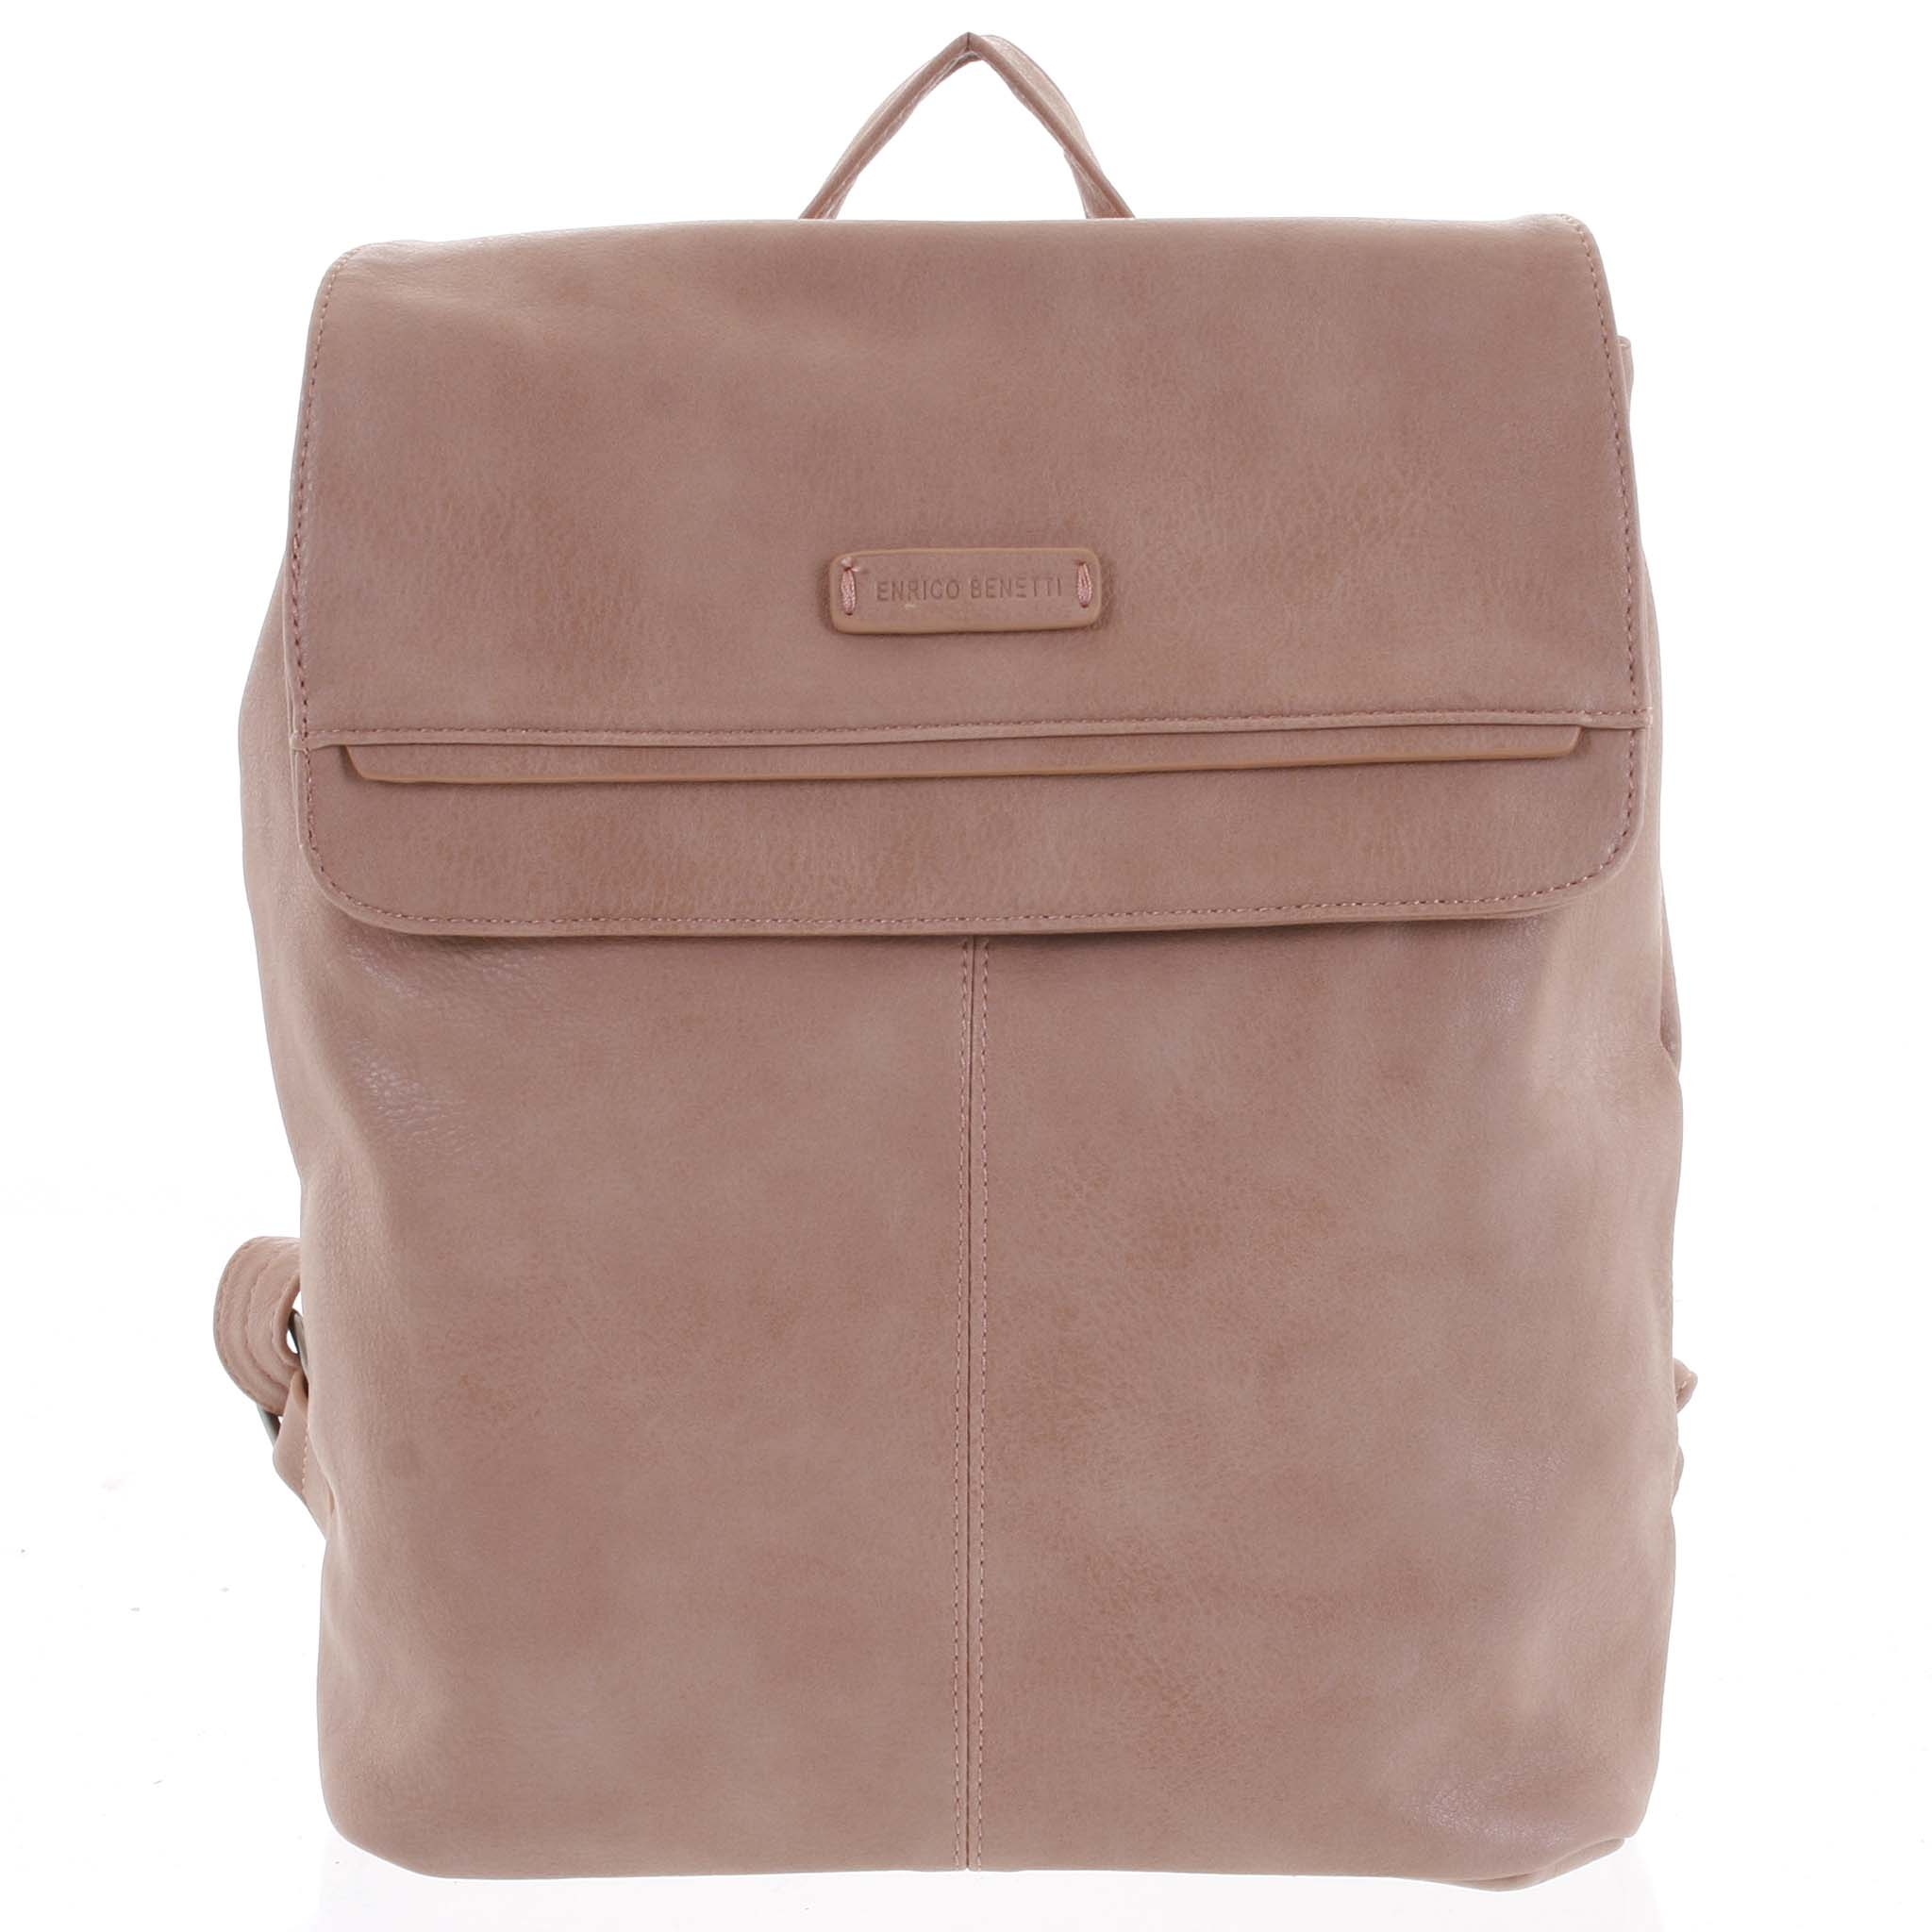 Dámský stylový batoh růžový - Enrico Benetti Neneke